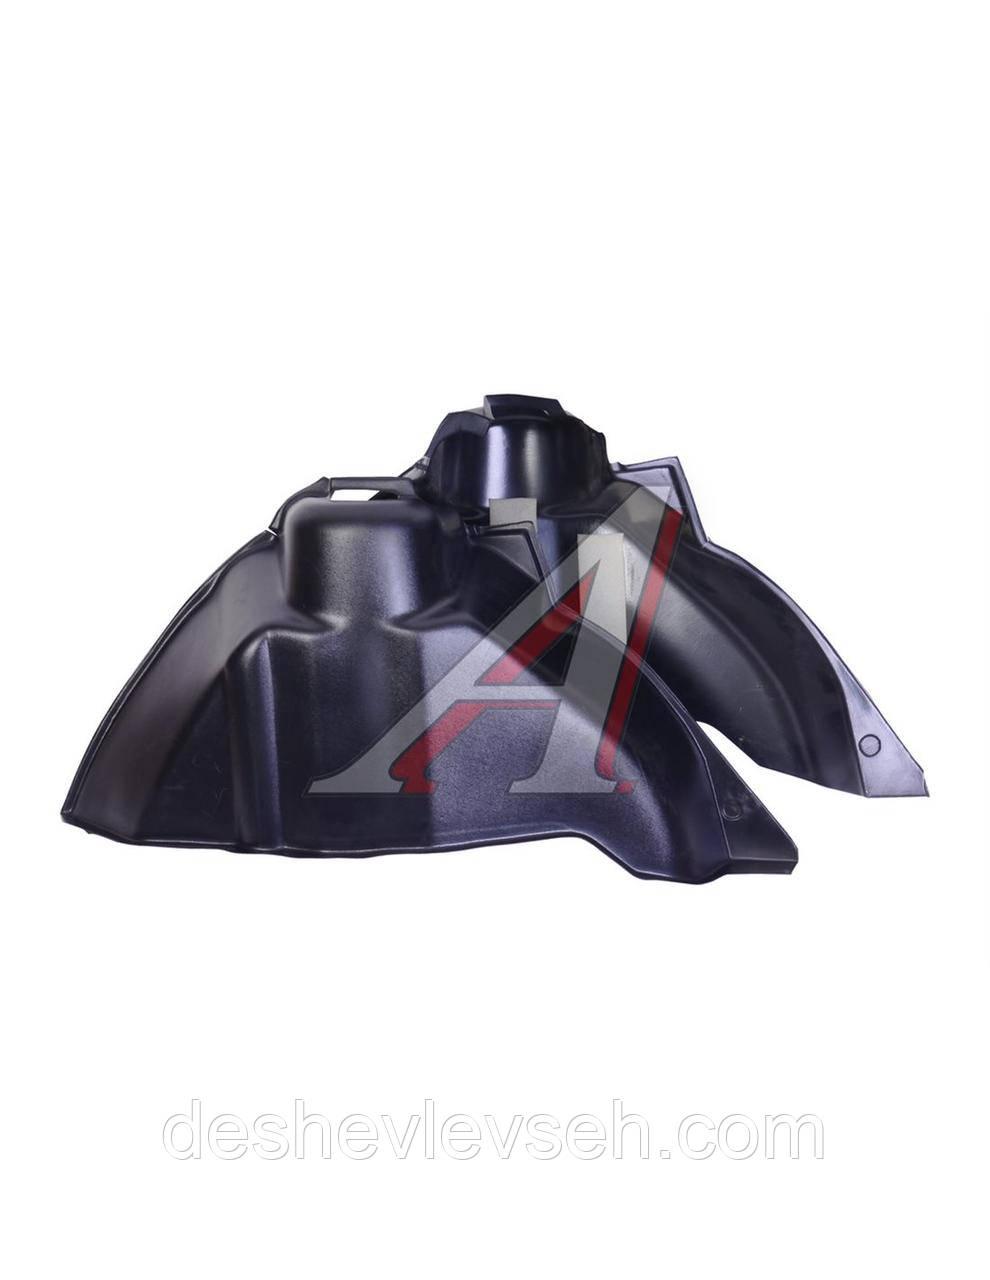 Обивка багажника ВАЗ-2108  арки колеса прав.+лев. пластик, 2108-5402220/21 (Сызрань)